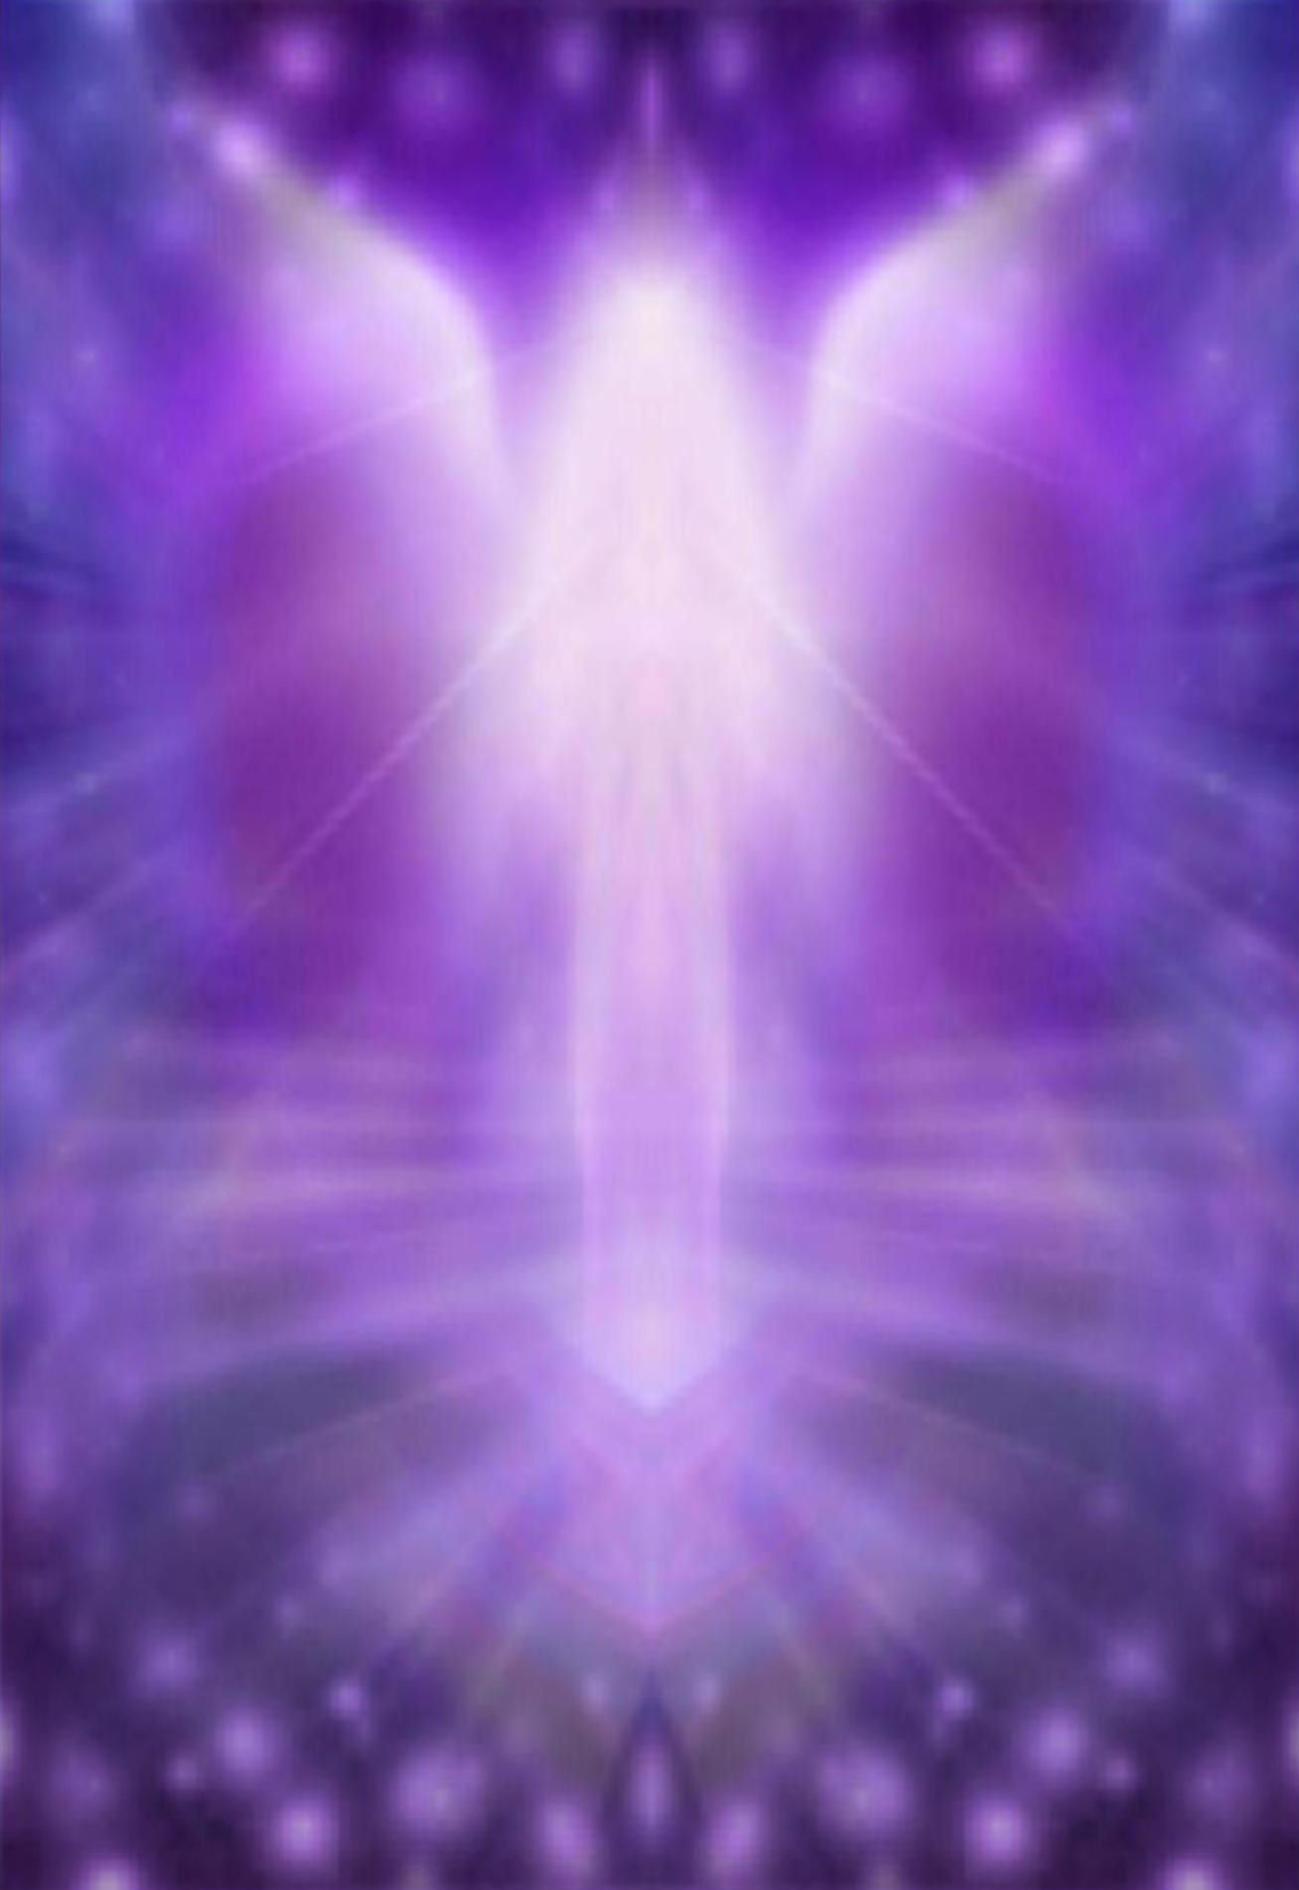 http://www.crystalheartpsychics.com/wp-content/uploads/2016/09/6ea342db-4e99-4caa-95a8-9874a342b724.jpg